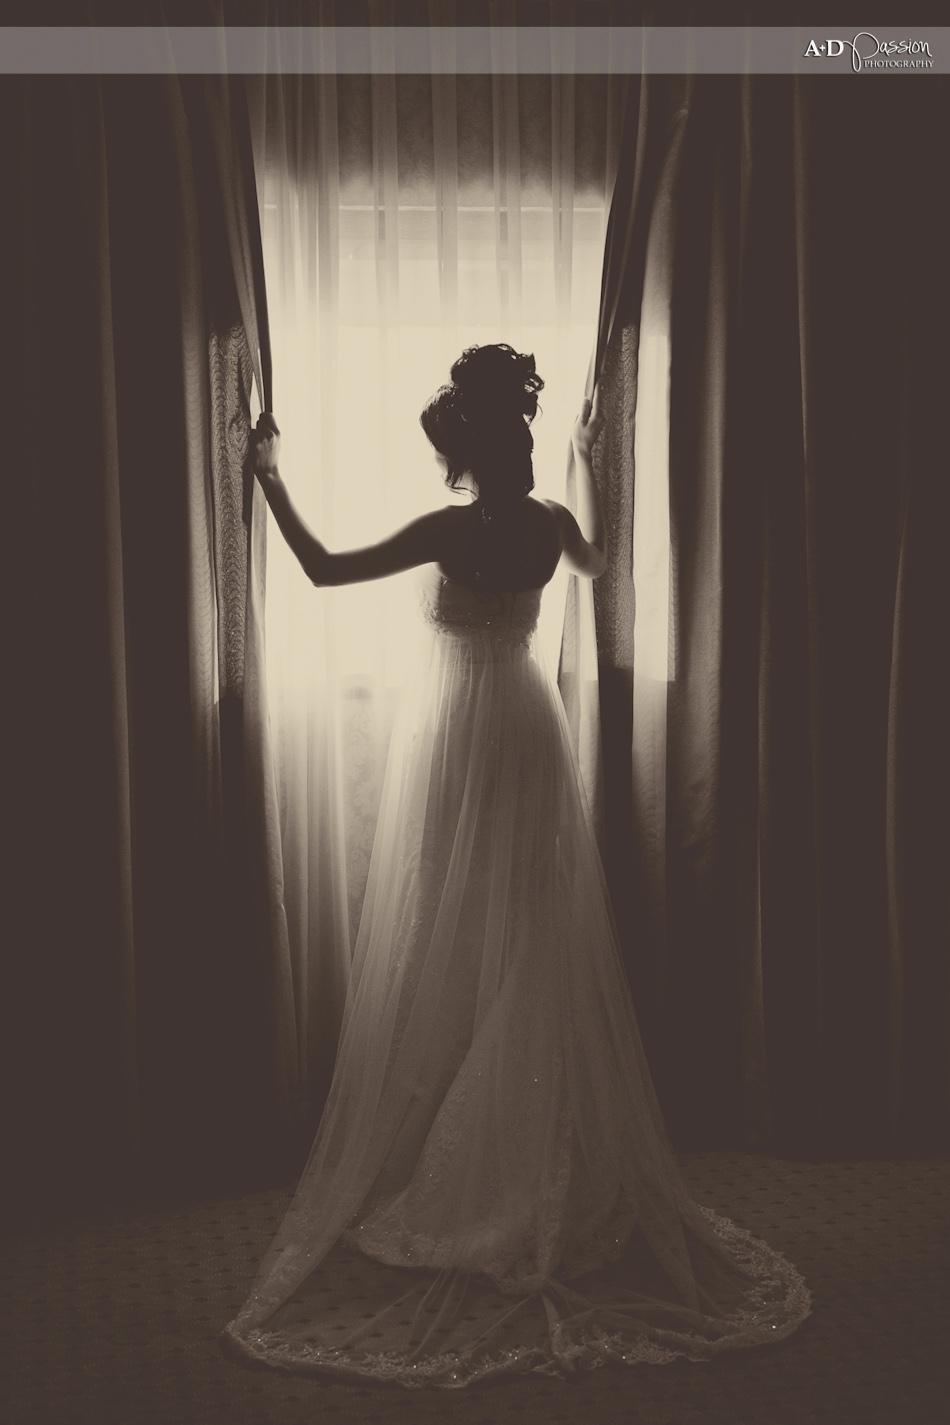 AD Passion Photography | 20120930_Gabriel&Iveth_Fotograf-profesionist-nunta_Nunta-Zaragoza-Spania_0018 | Adelin, Dida, fotograf profesionist, fotograf de nunta, fotografie de nunta, fotograf Timisoara, fotograf Craiova, fotograf Bucuresti, fotograf Arad, nunta Timisoara, nunta Arad, nunta Bucuresti, nunta Craiova